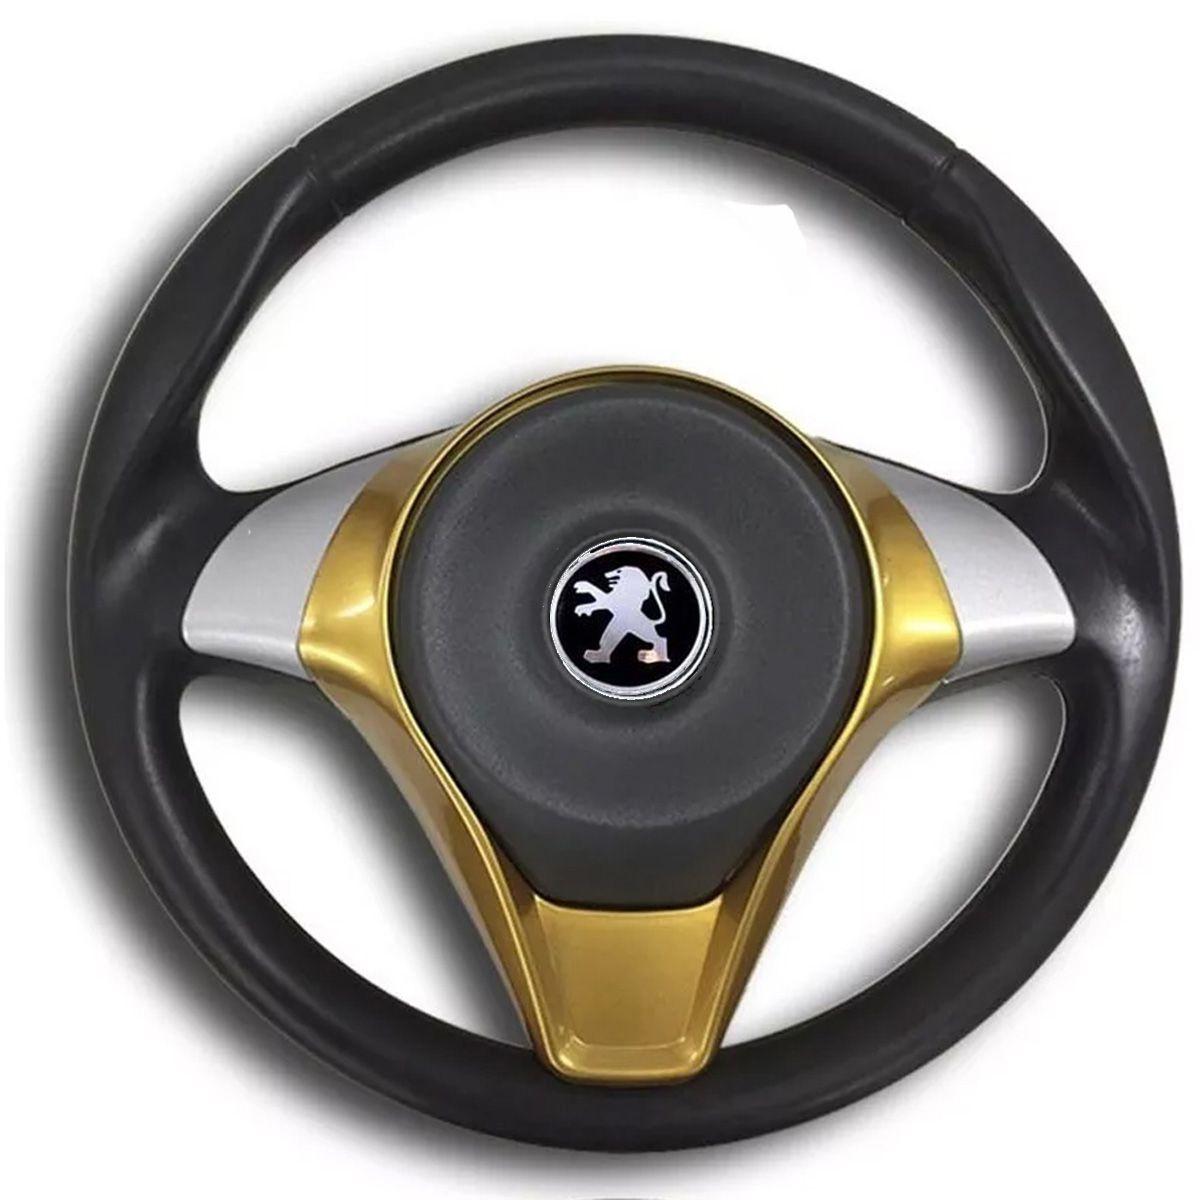 Volante Esportivo Palio Sporting Peugeot 106 206 207 306 Sw Acionador de Buzina + Cubo